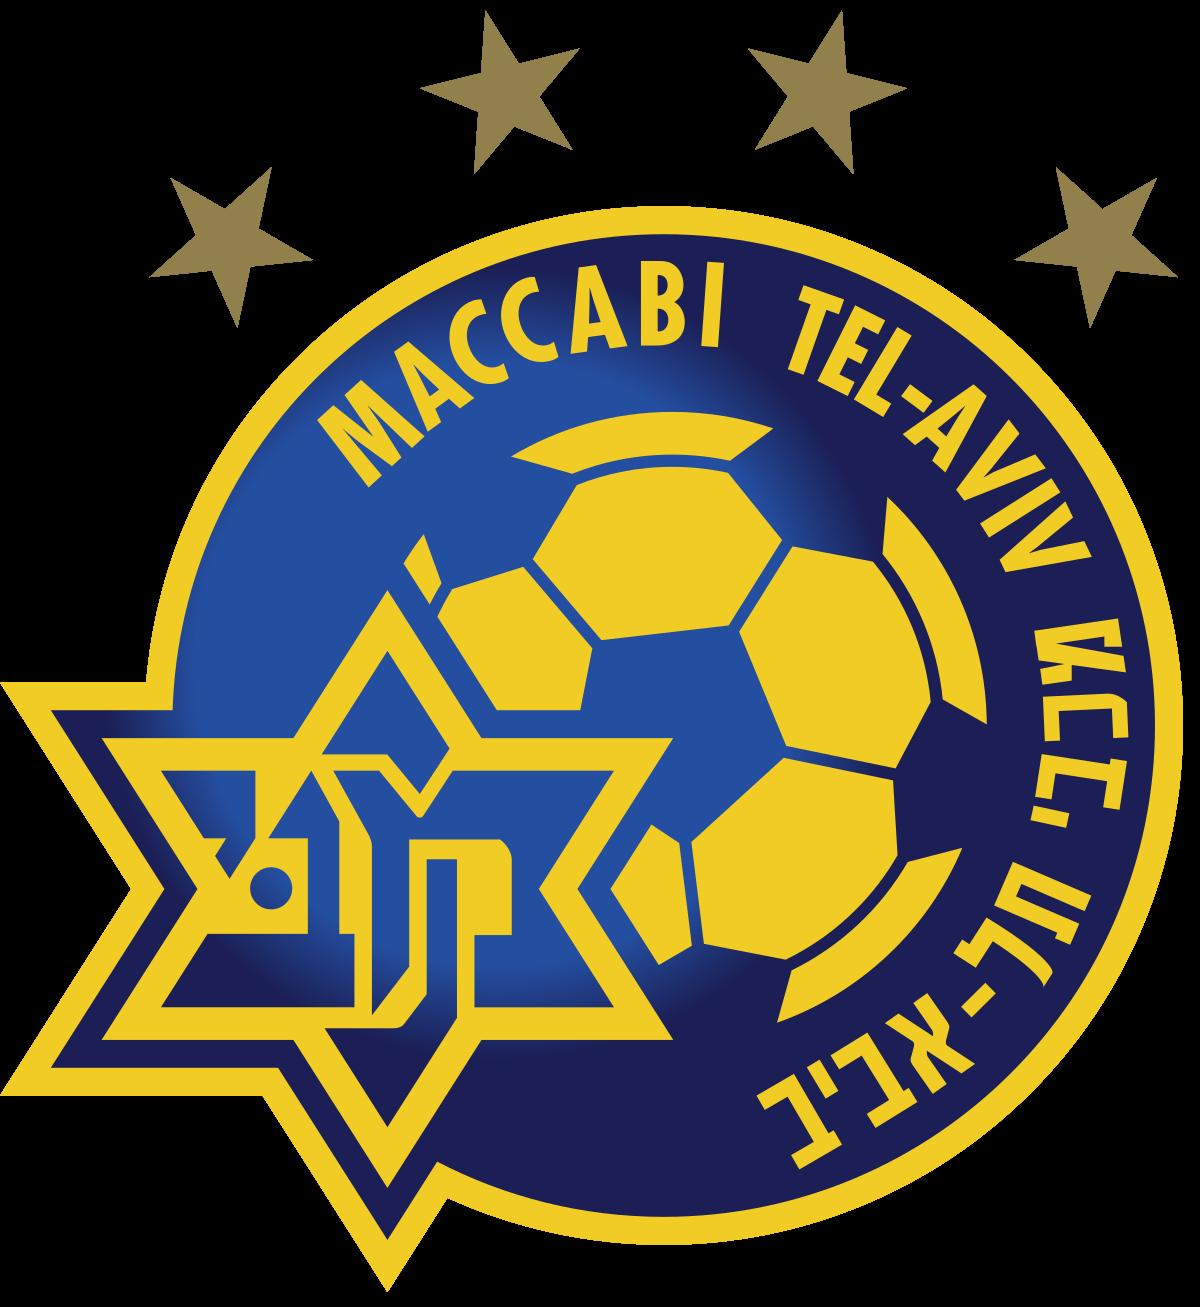 Maccabi Tel Aviv Logo 2019 20 Uefa Champions League Champions League Football Logo Tel Aviv